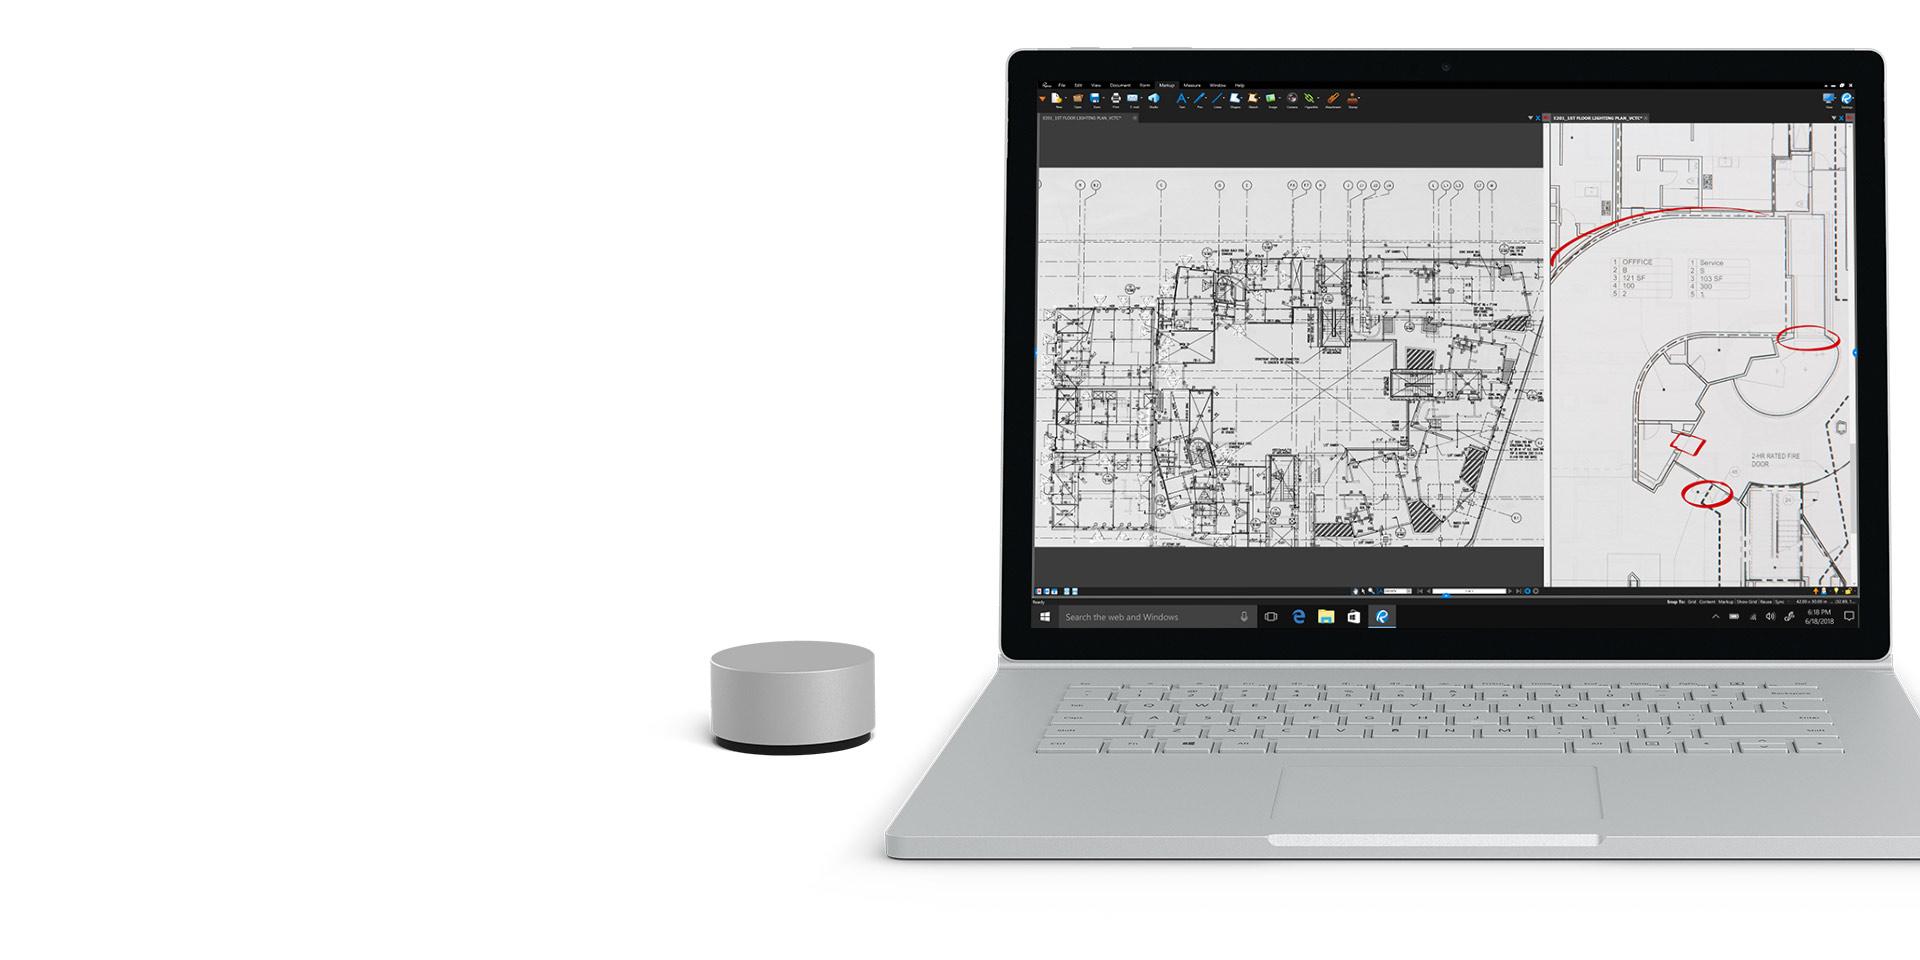 Surface Book 2 显示屏显示 Bluebeam